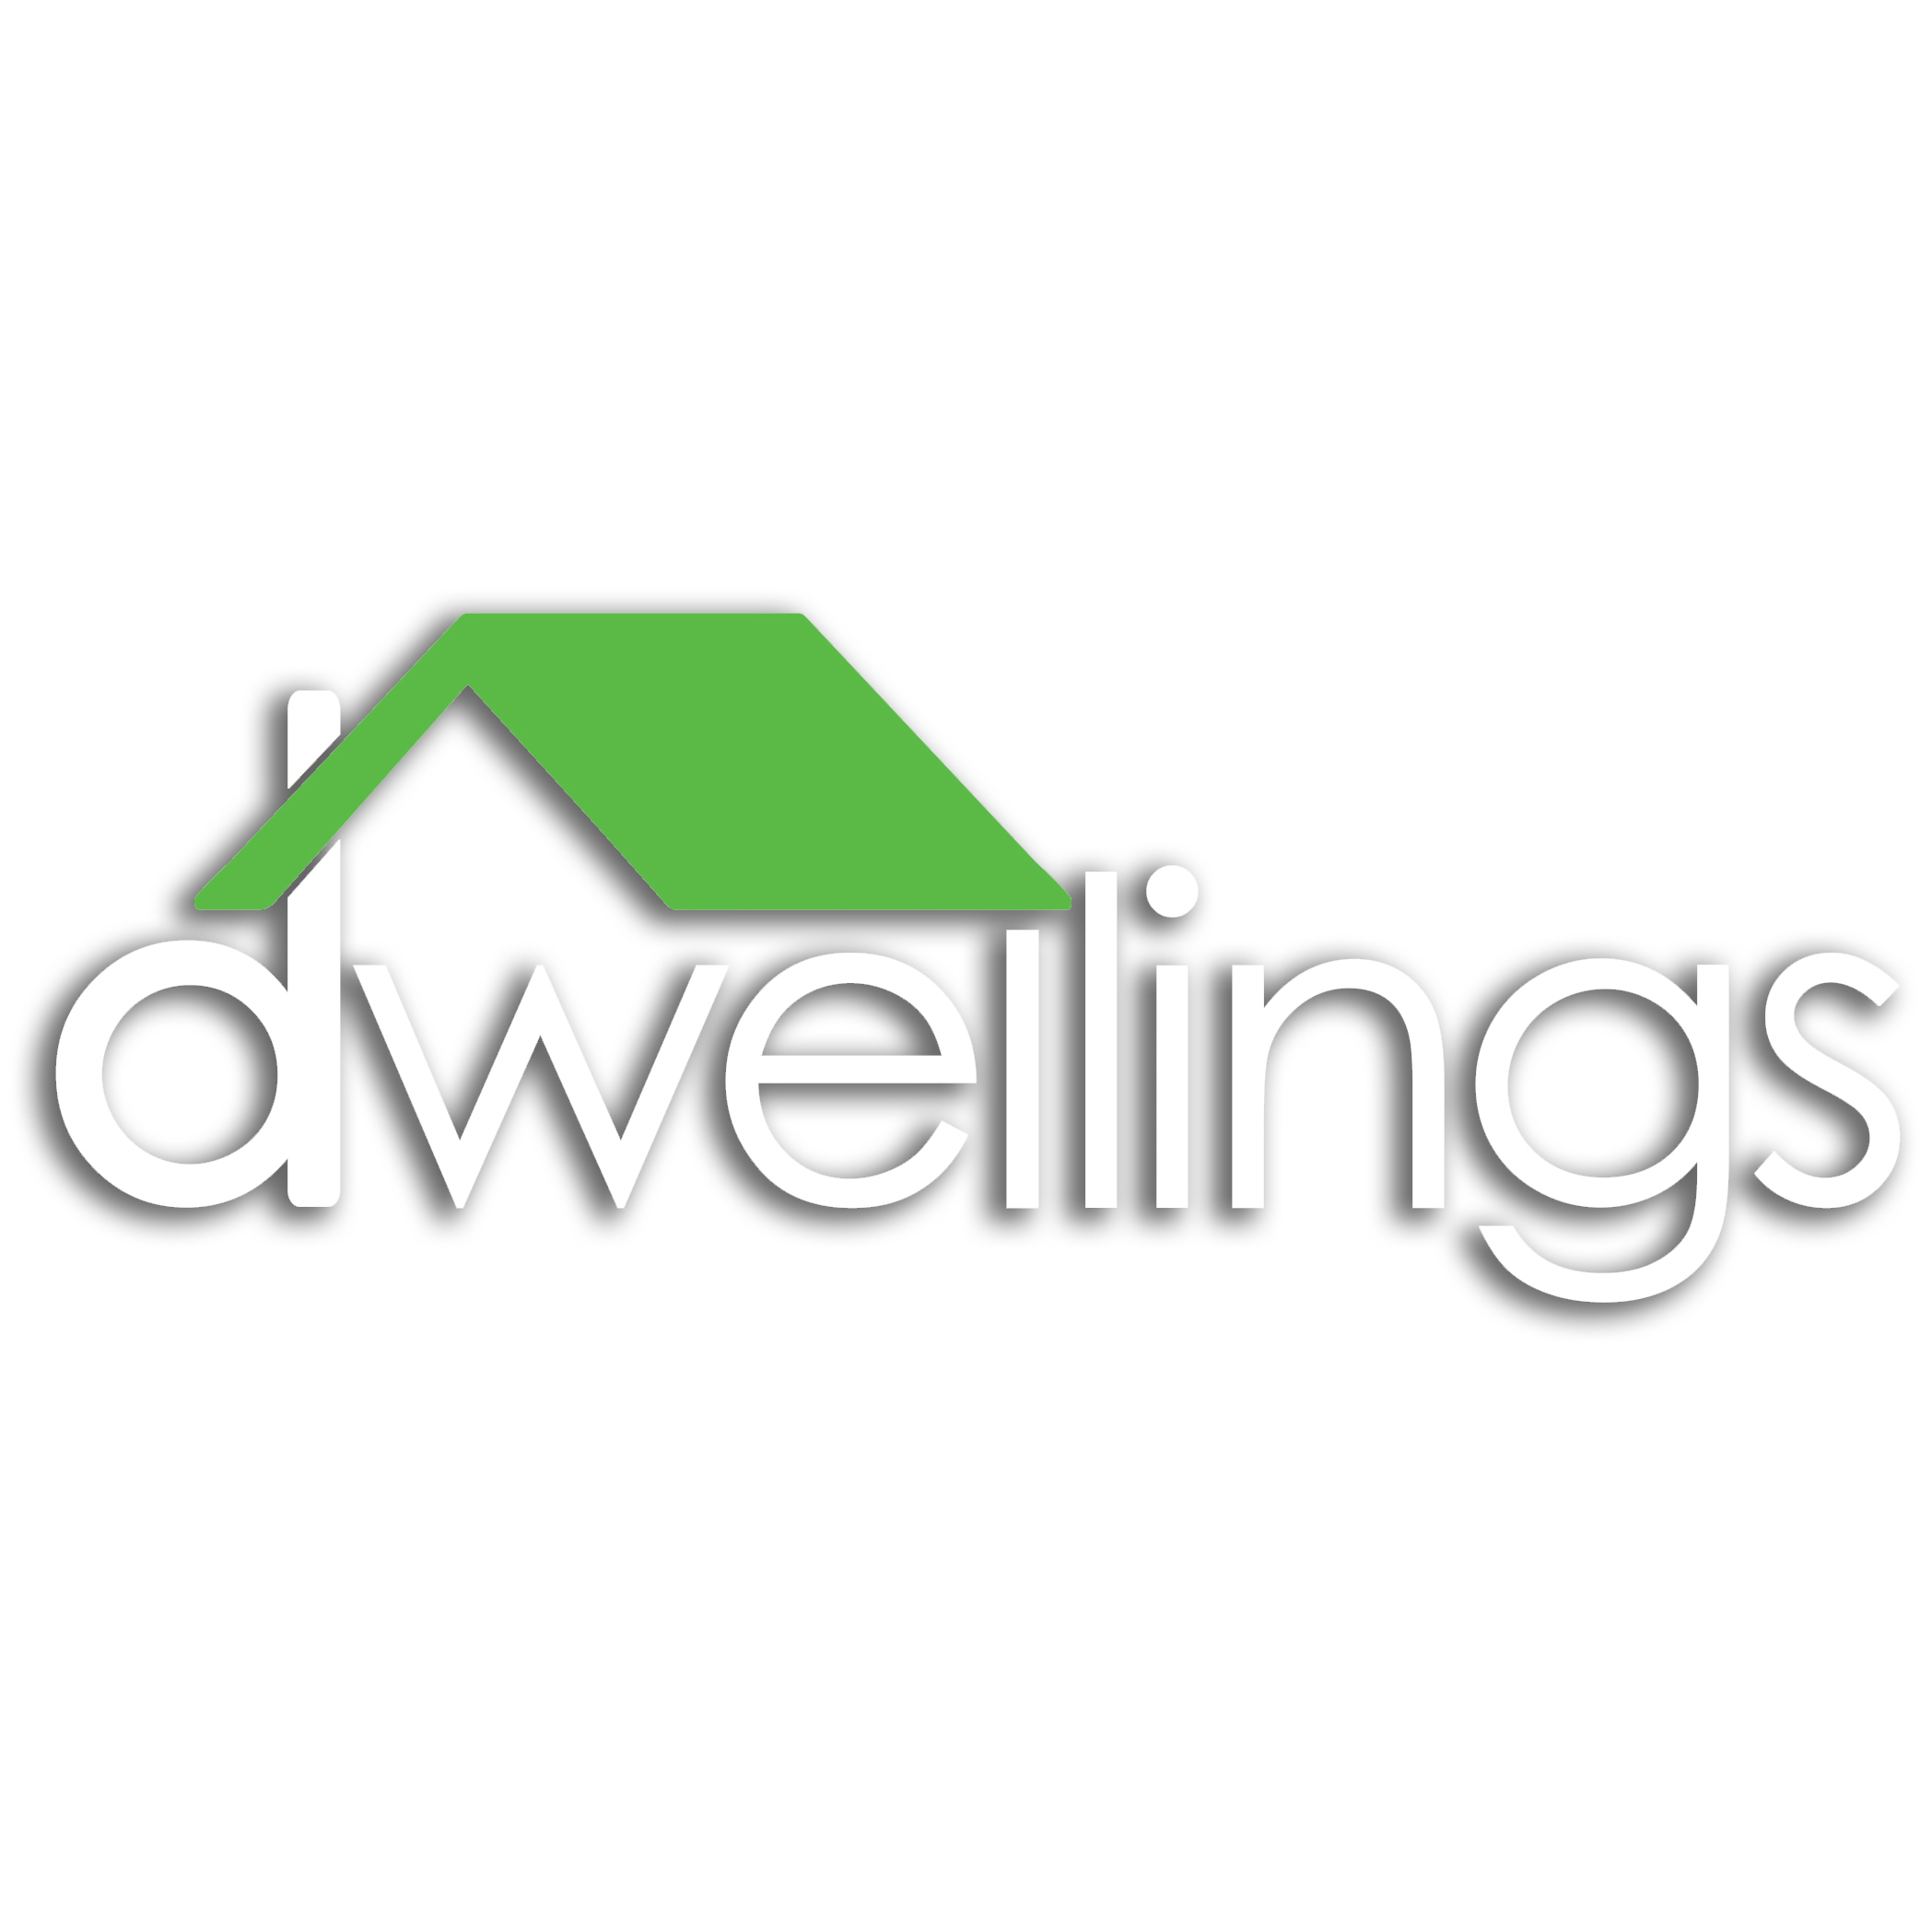 Dwellings Realty Group